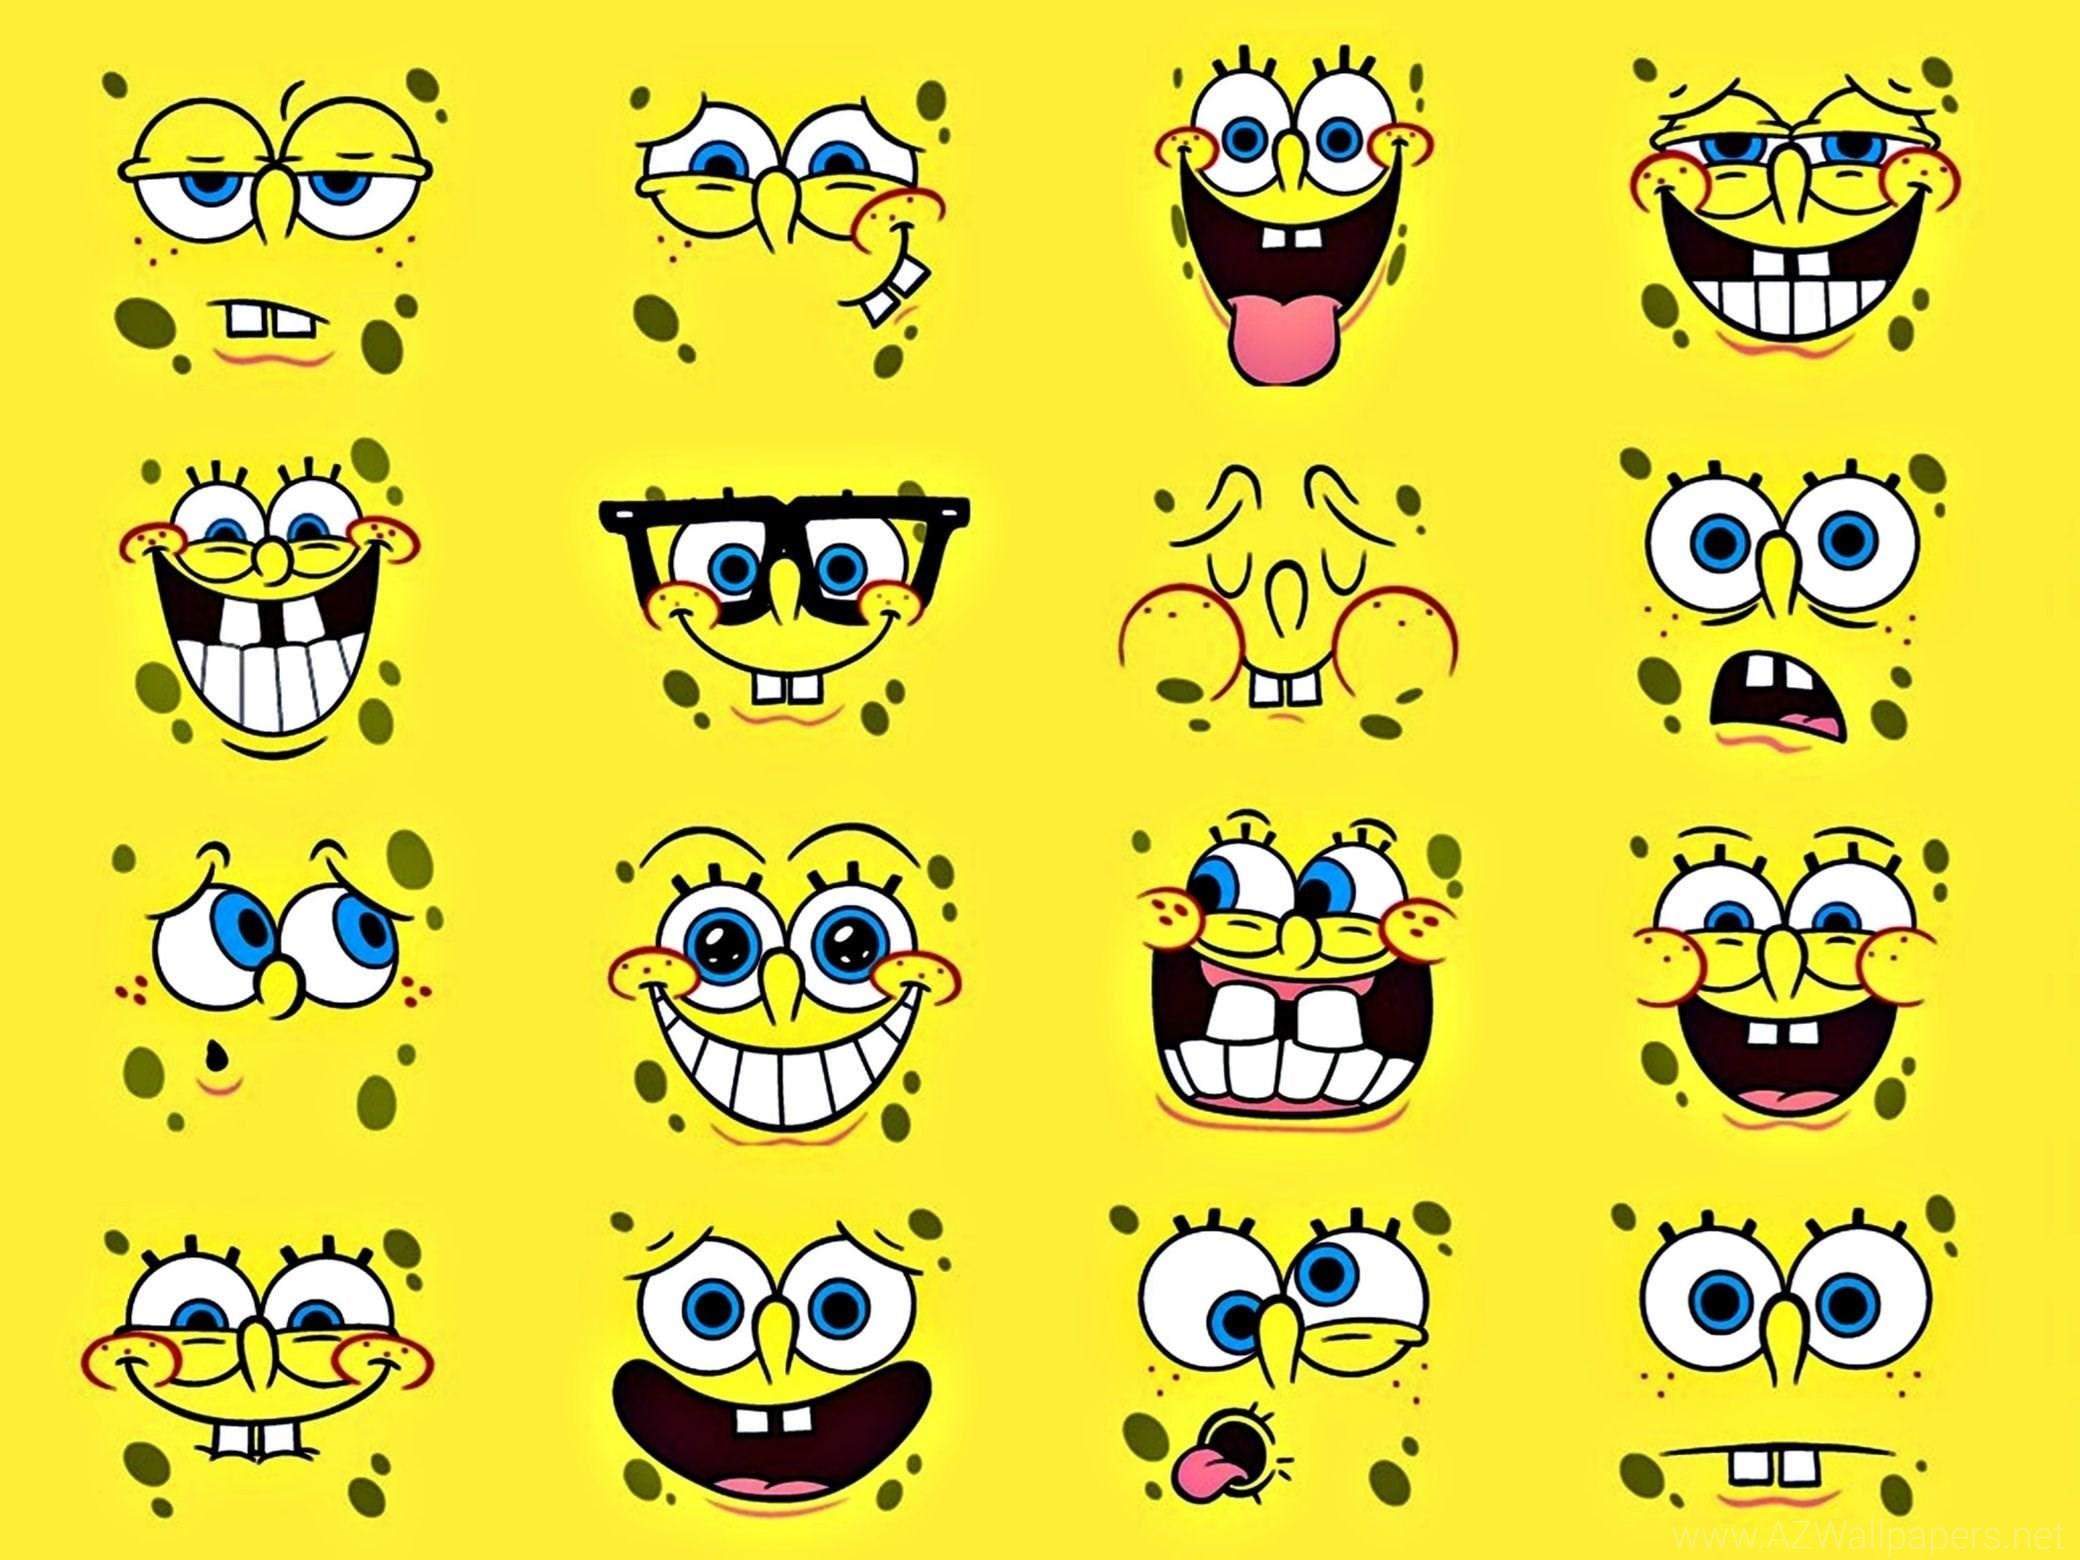 Face Spongebob Squarepants Anime HD Wallpapers Picture